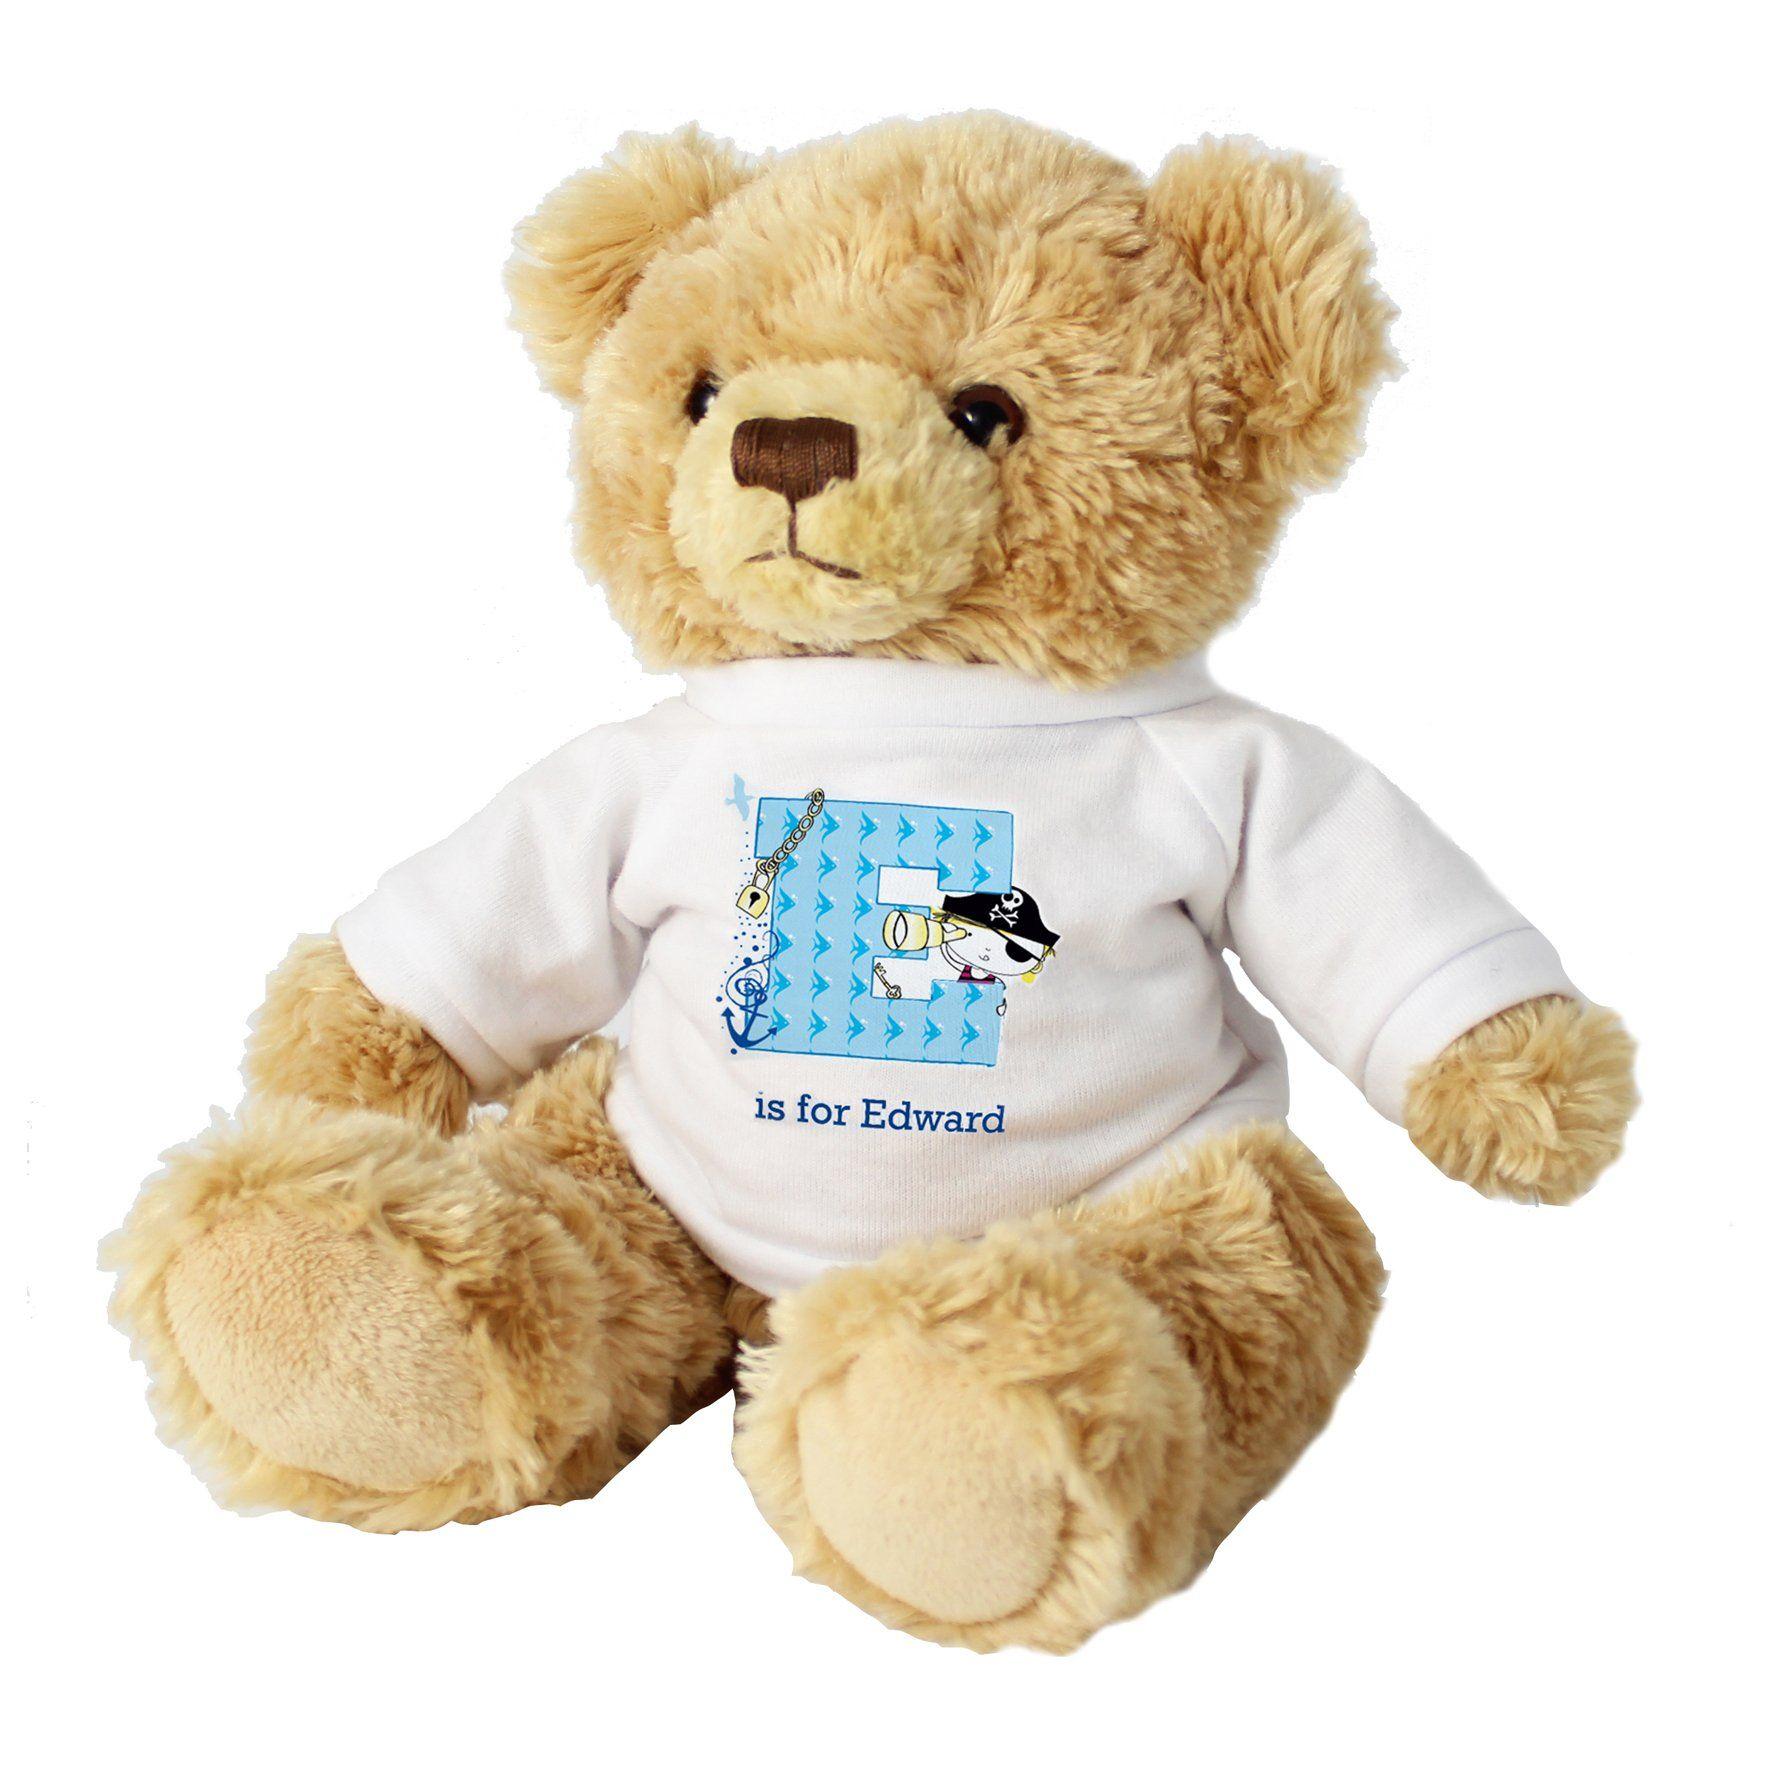 Pirate Personalised Teddy Bear